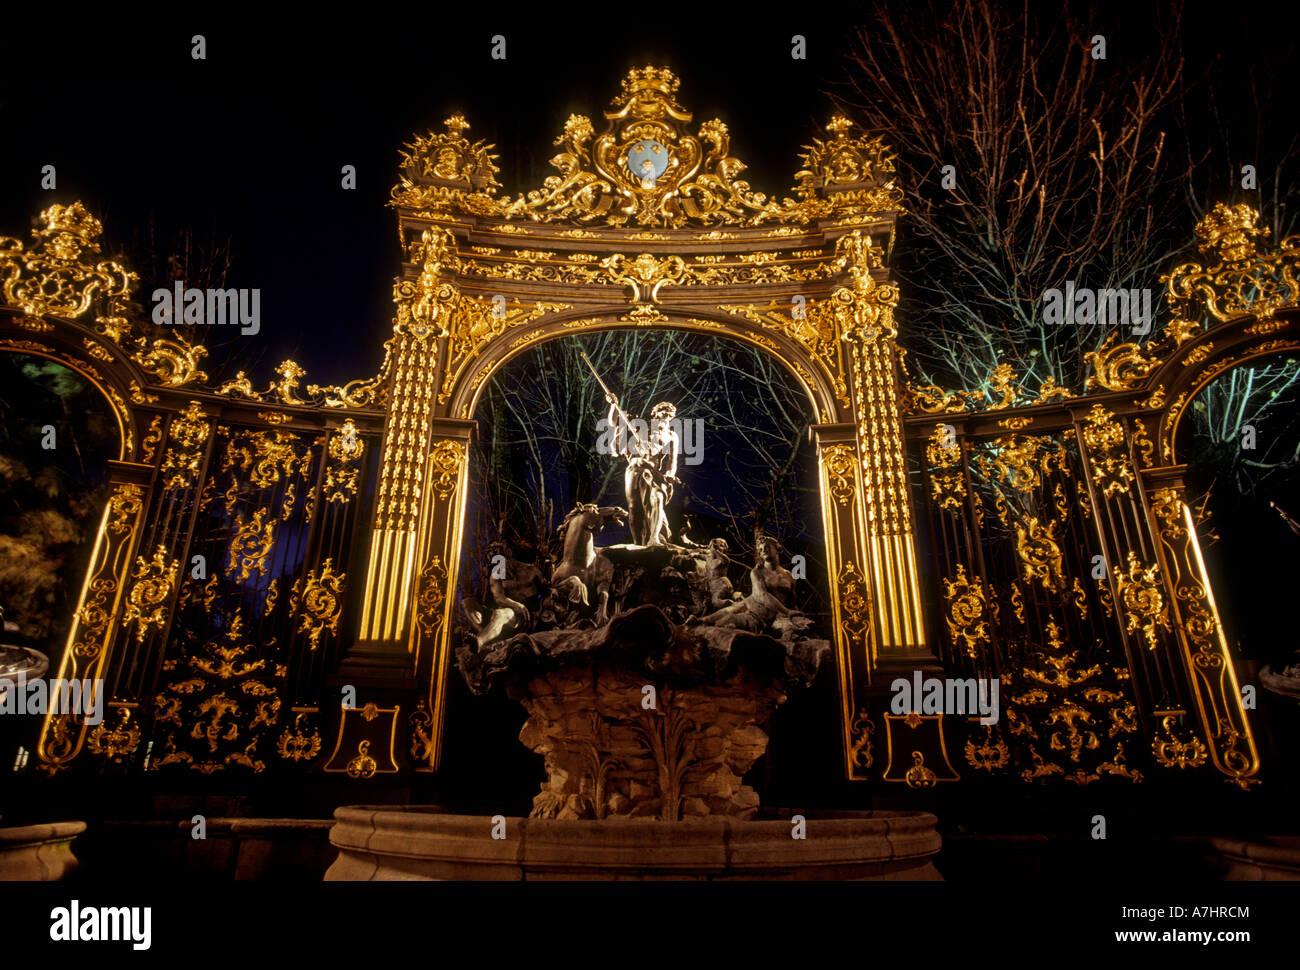 Neptune Fountain, Fontaine Neptune, Greek God, Olympian God, Place Stanislas, city of Nancy, Nancy, Lorraine, France, - Stock Image